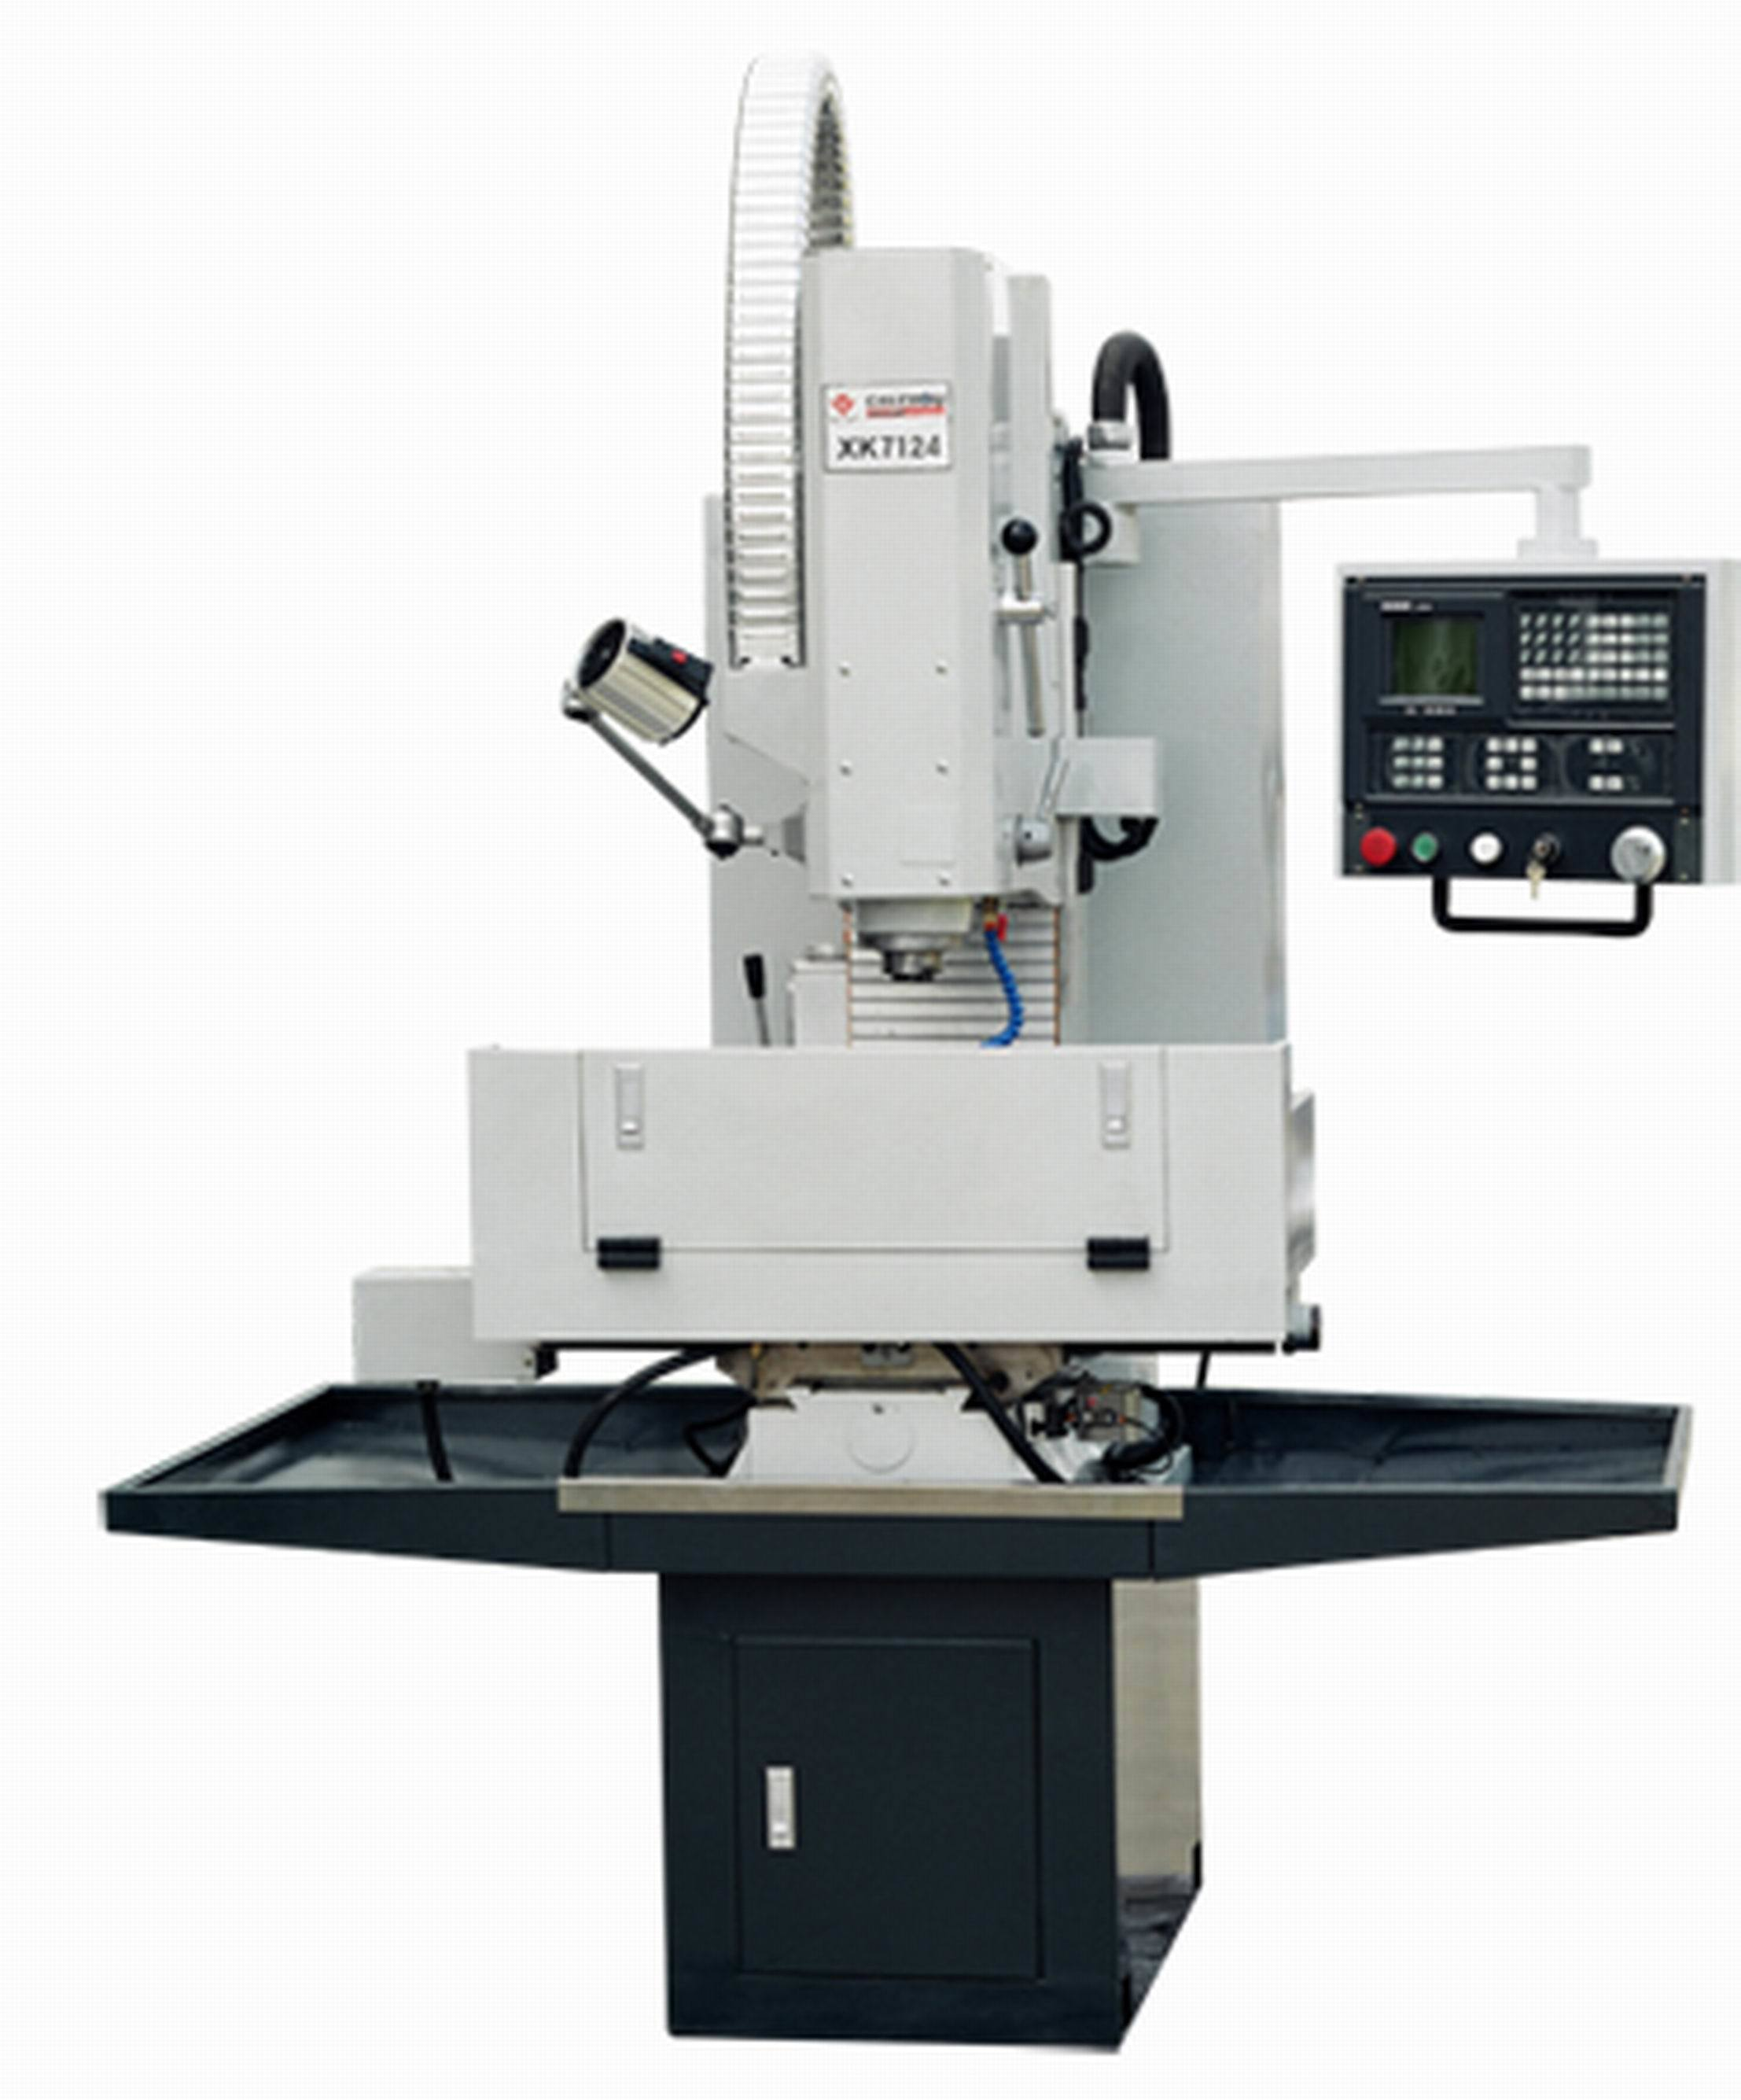 CNC Milling Machine (XK7124 XK7124A)